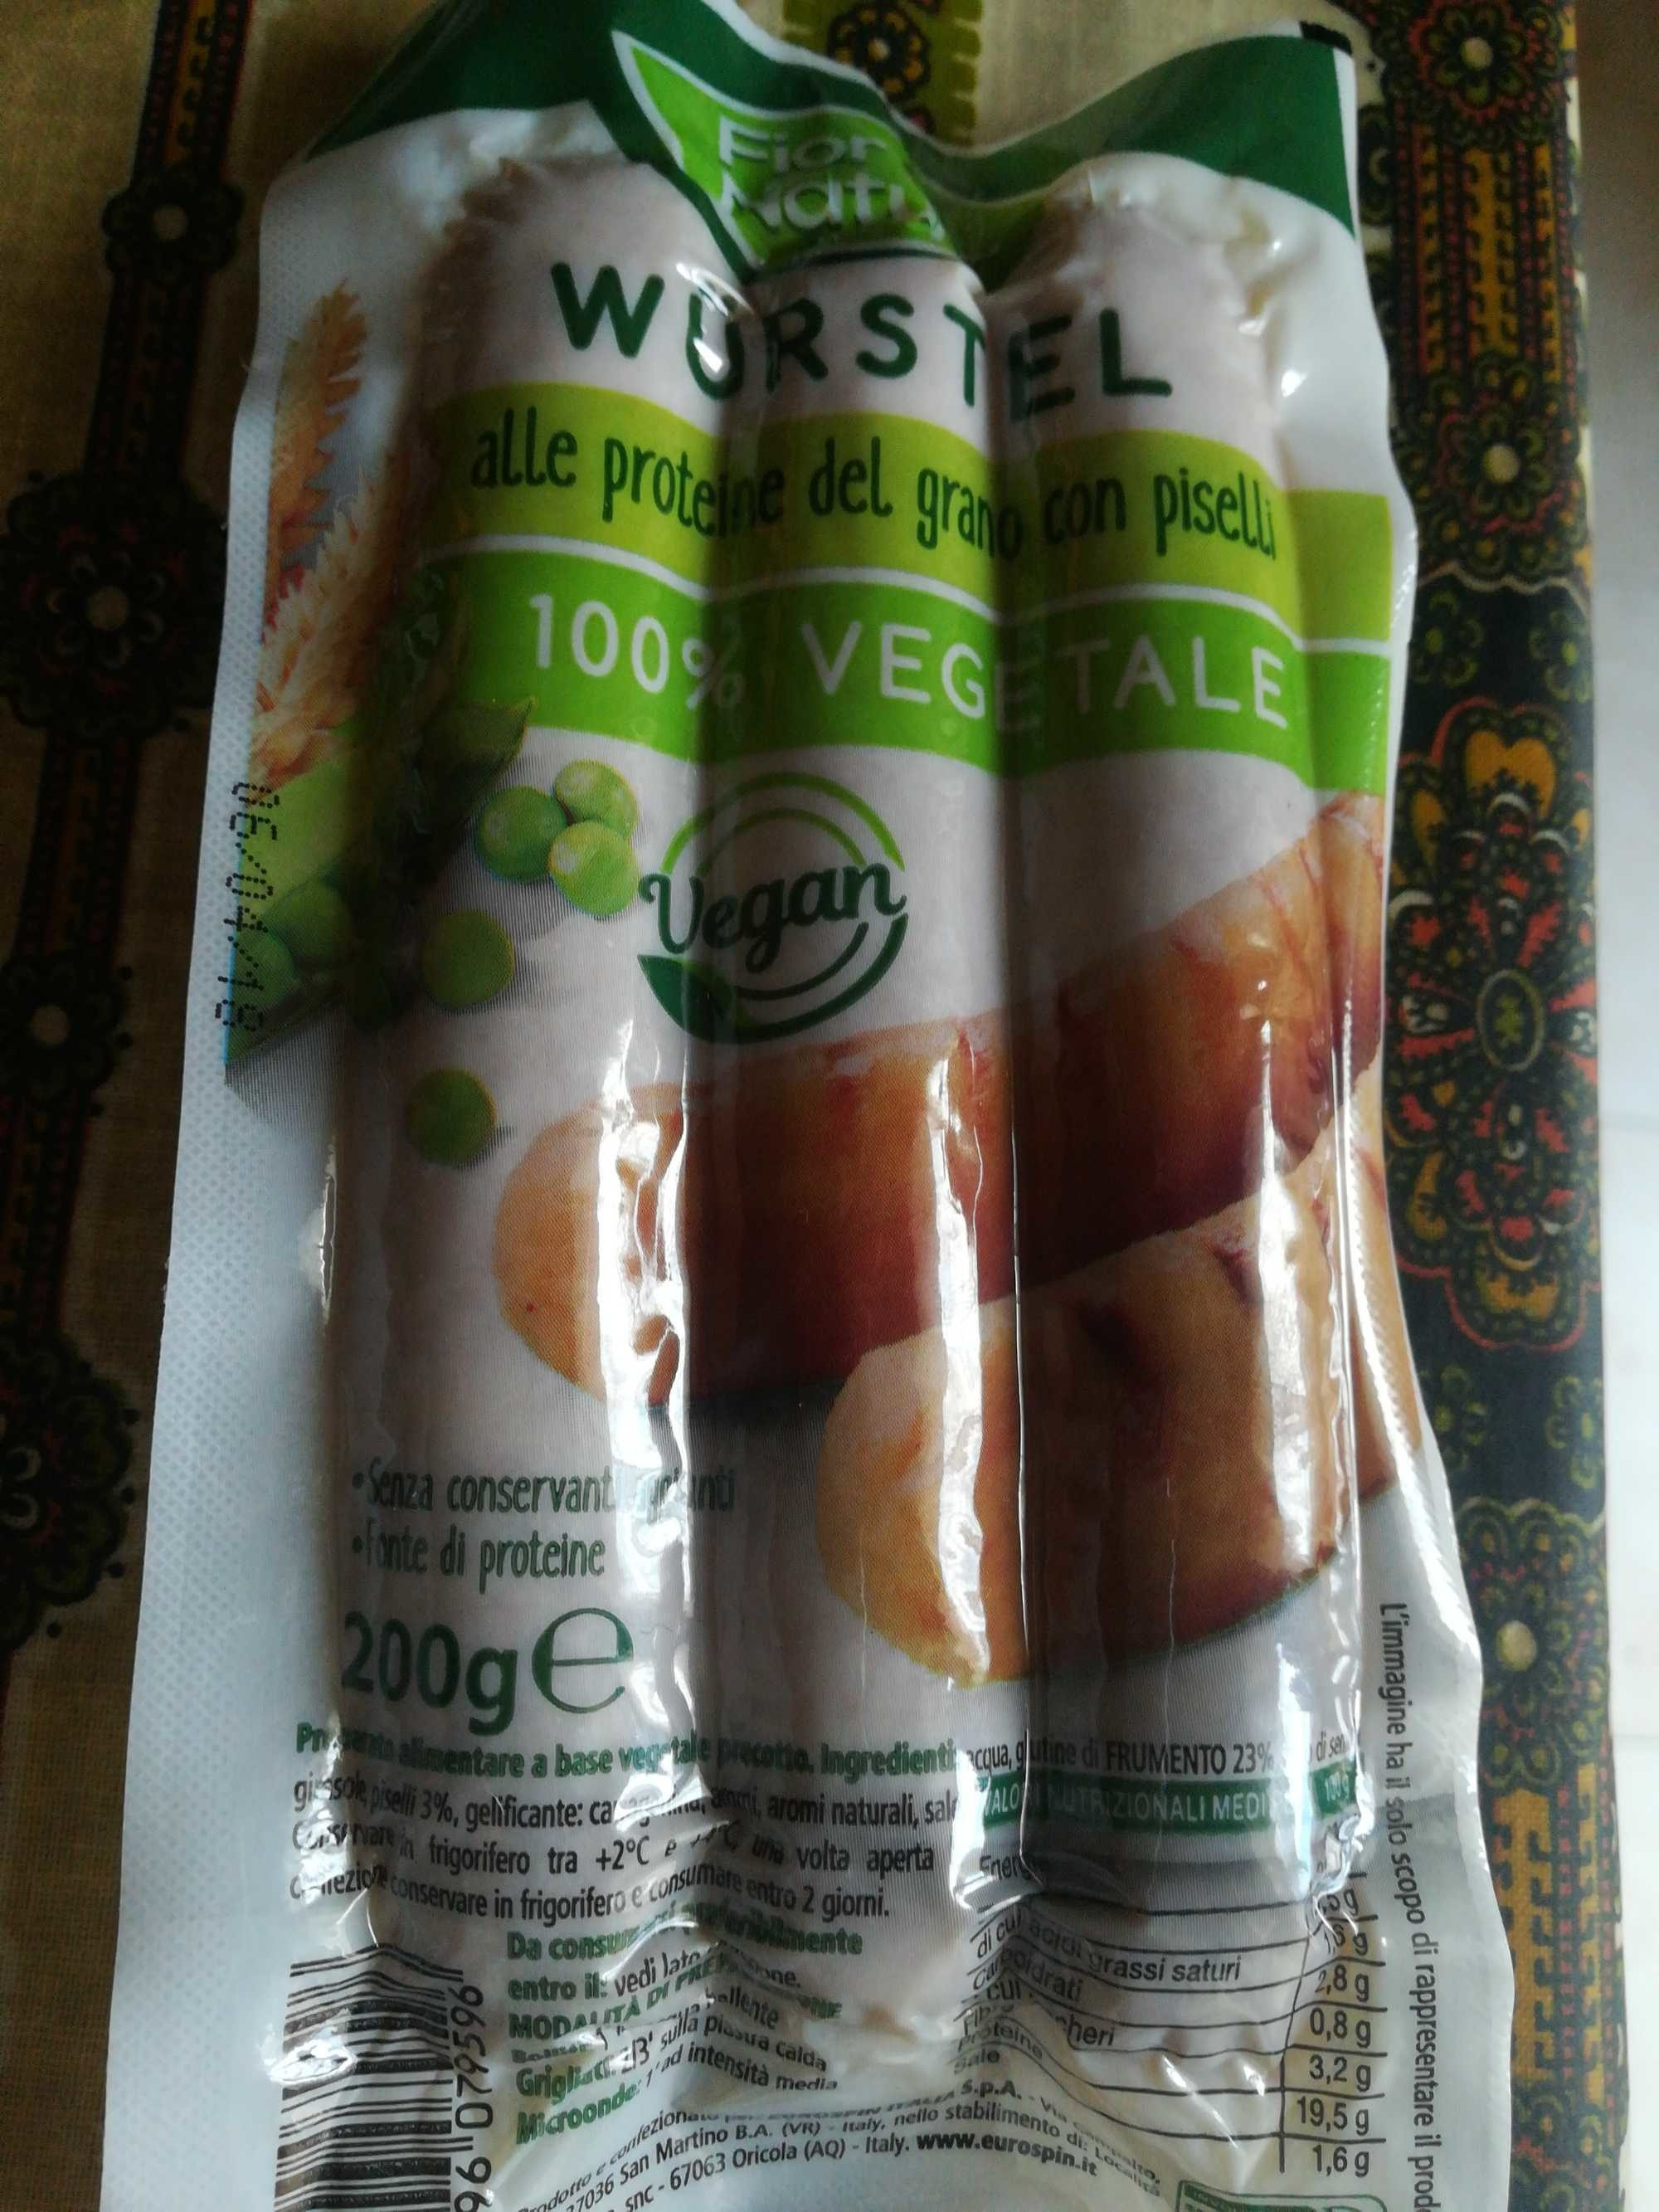 Würstel 100% vegetale alle proteine del grano can piselli - Produit